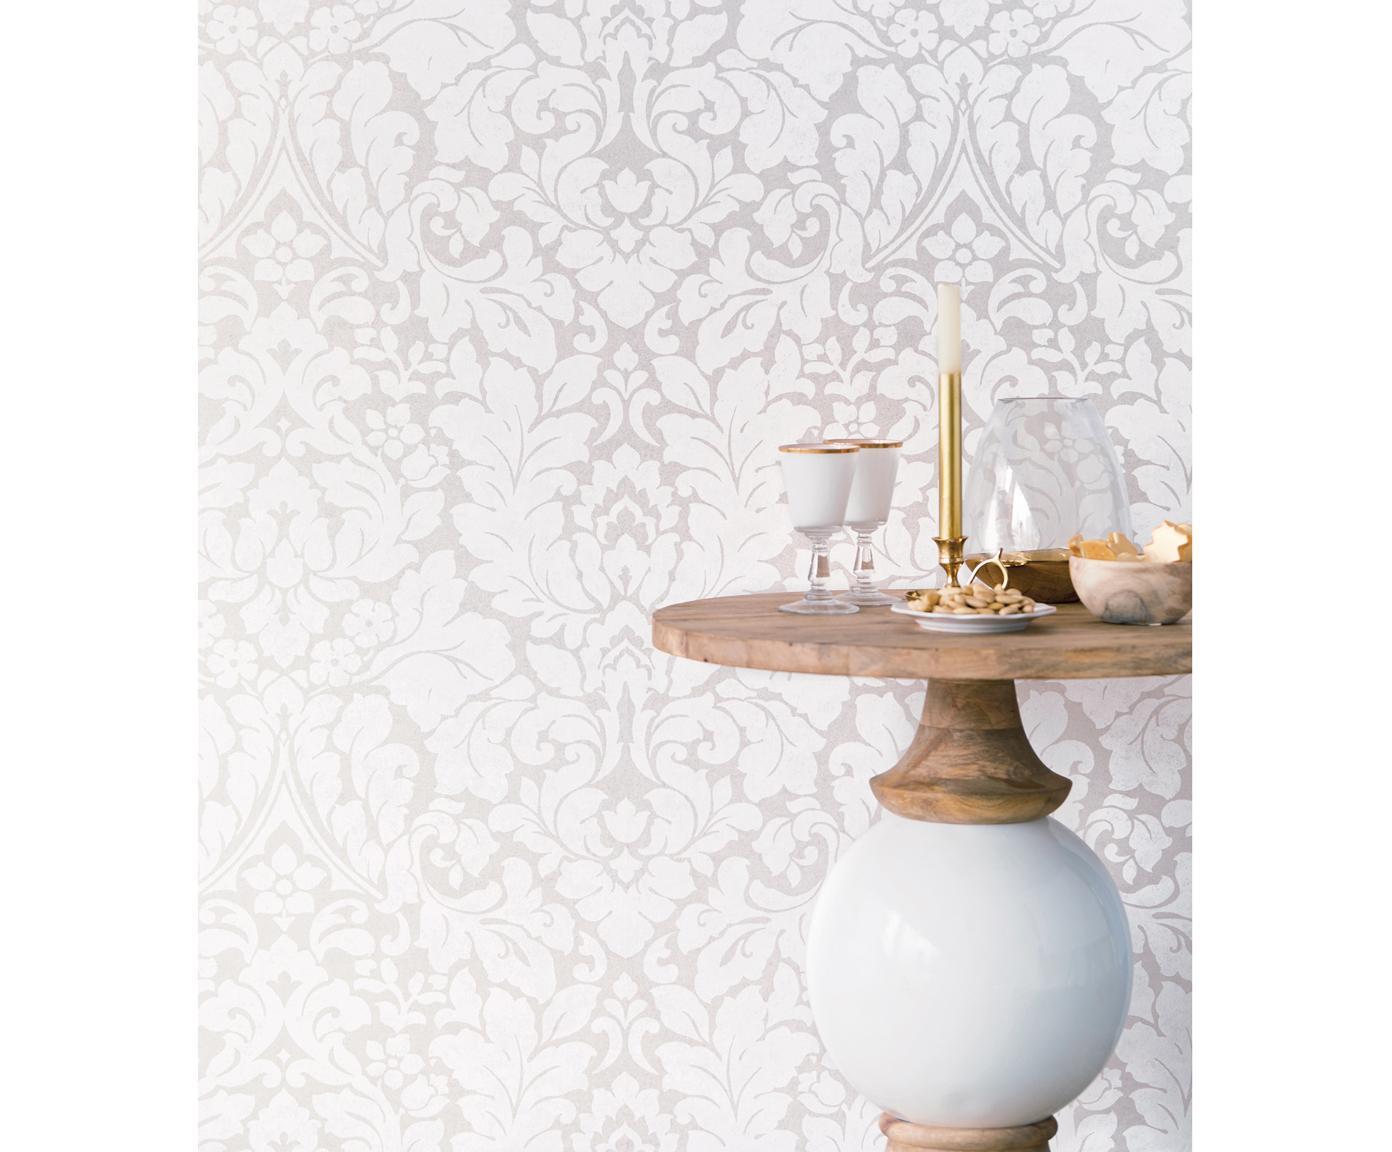 Tapete Ornament Flower, Vlies, Beige, 68 x 1000 cm